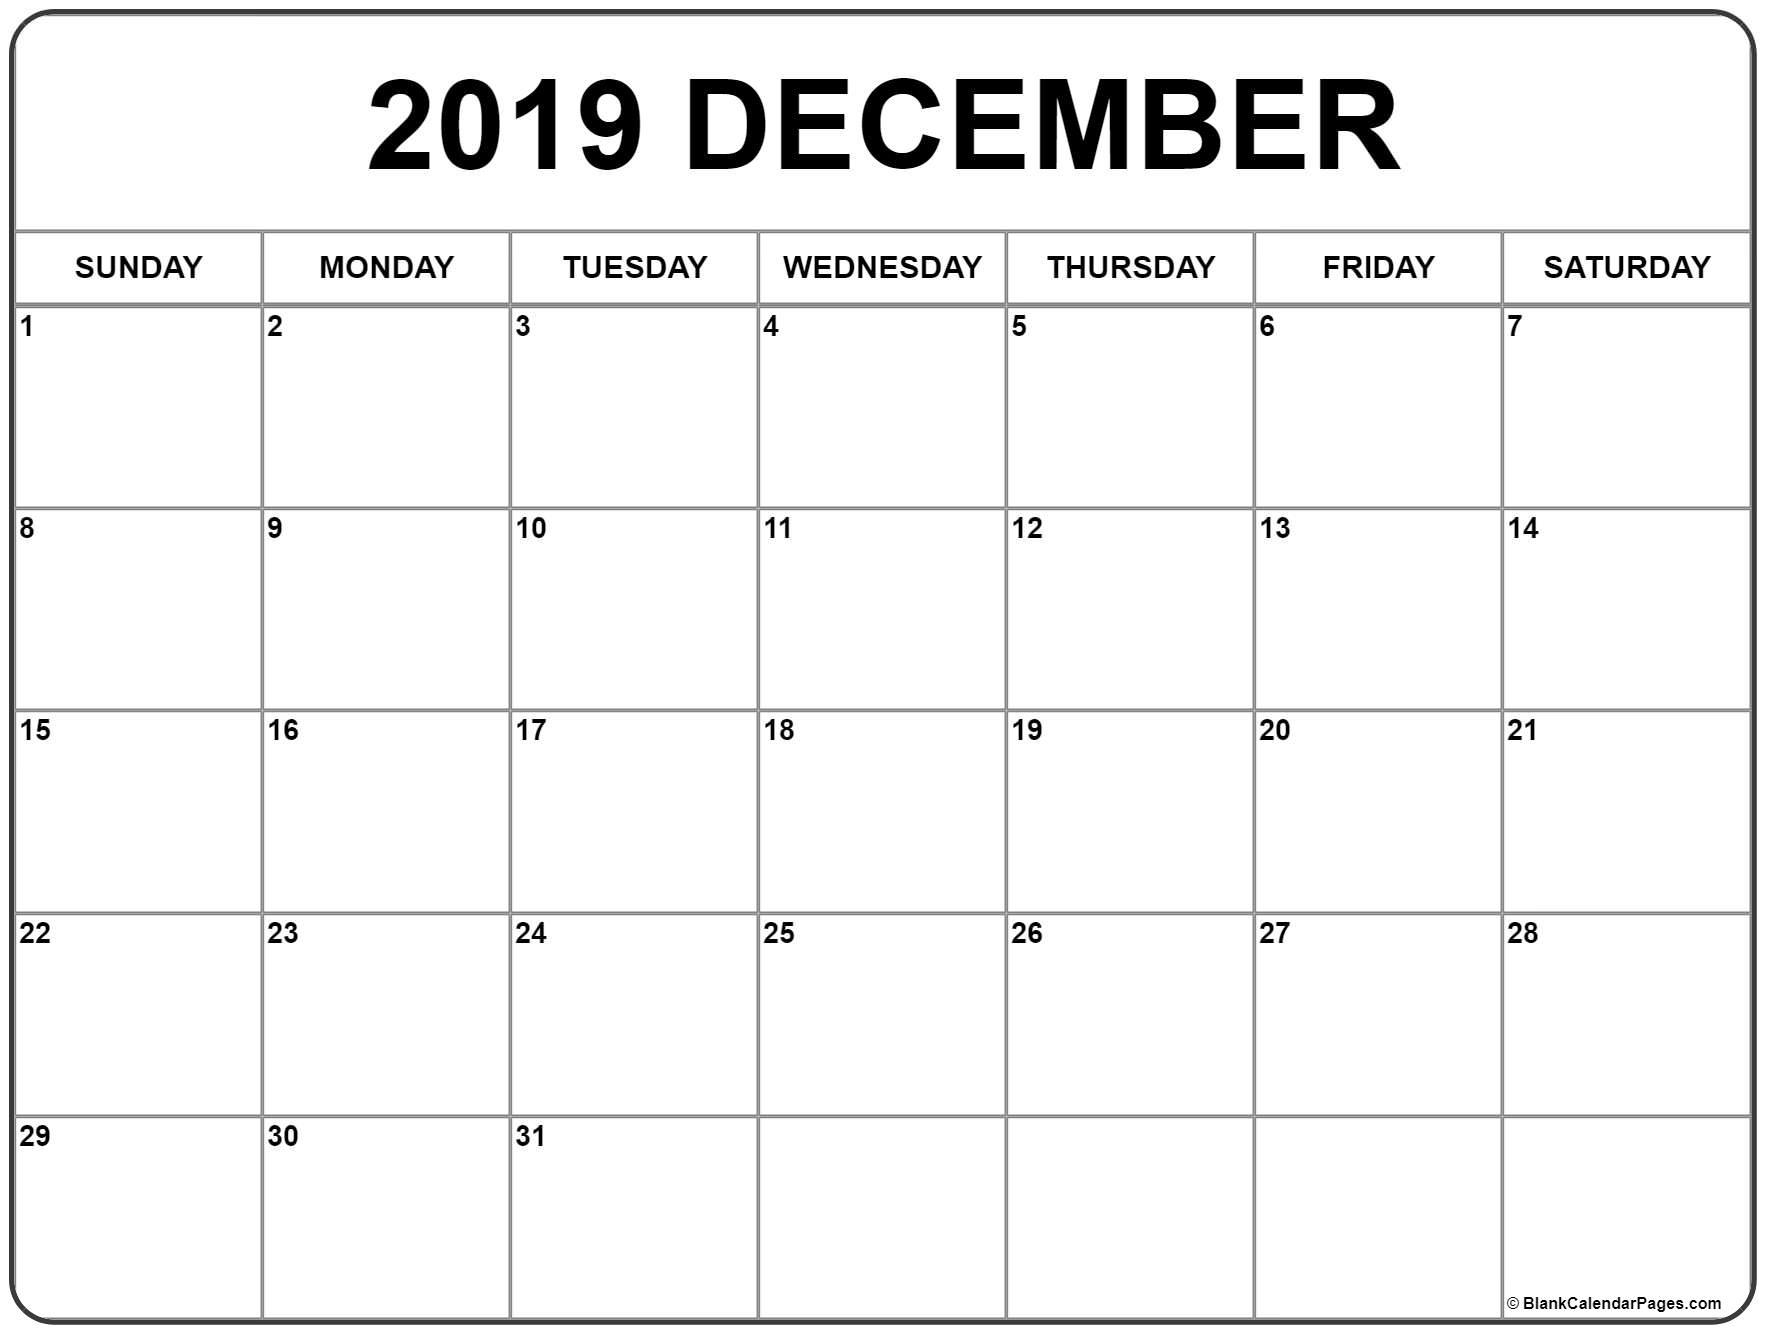 December 2019 Printable Calendar - Create Your Calendar For in Fill In Calendar 2019 Printable